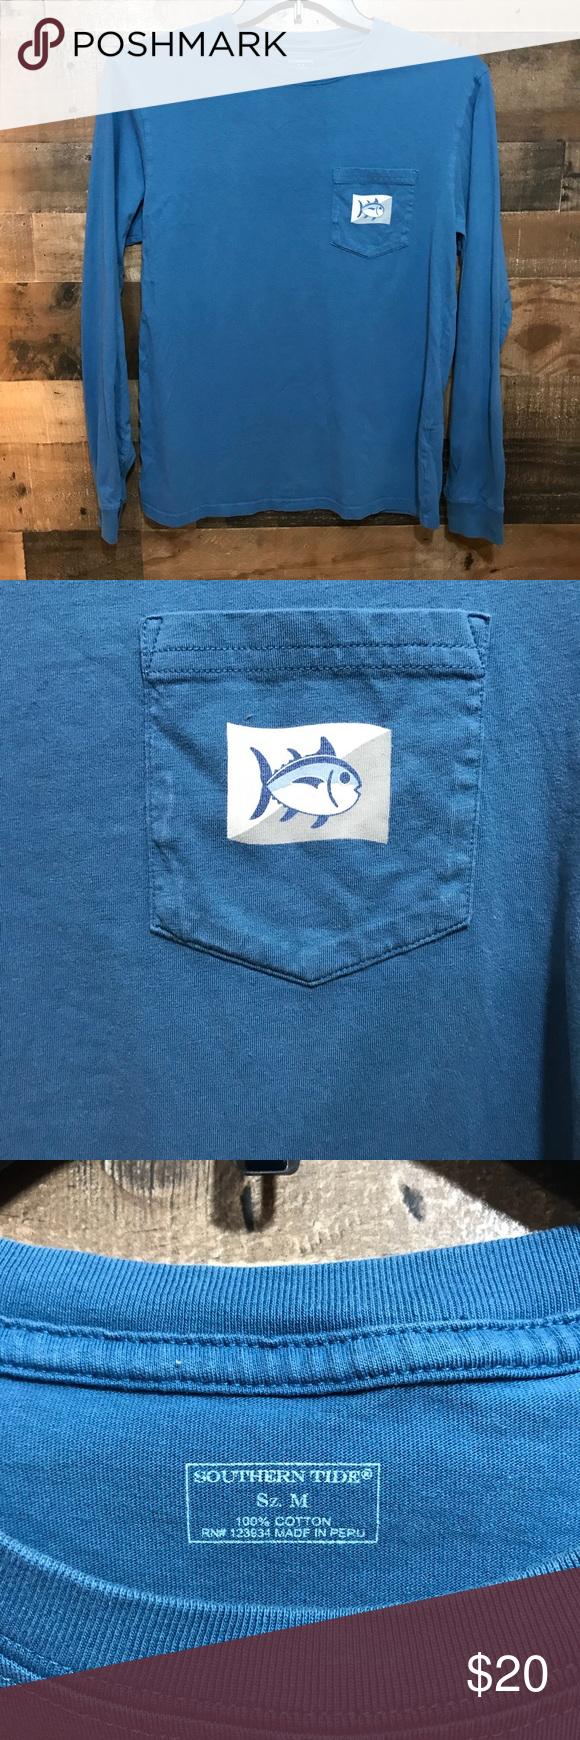 Southern Tide Blue Long Sleeves T Shirt Sz Medium Long Sleeve Tshirt Long Sleeve Southern Tide